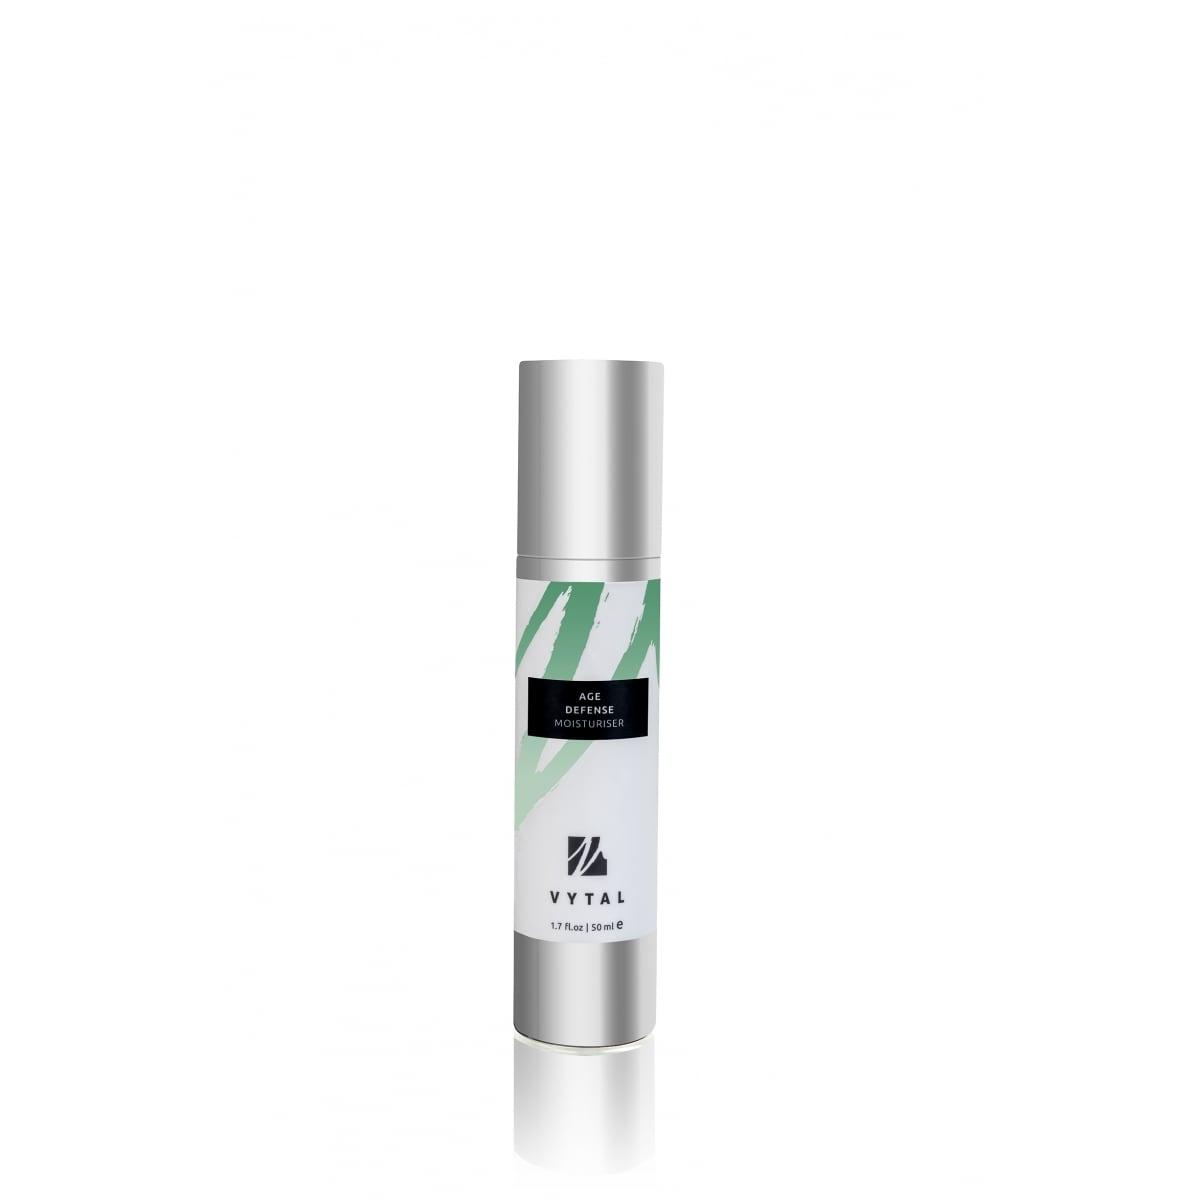 Soins beauté - Vytal Skin - SUN DEFENSE SPF 50+ (30 ml)